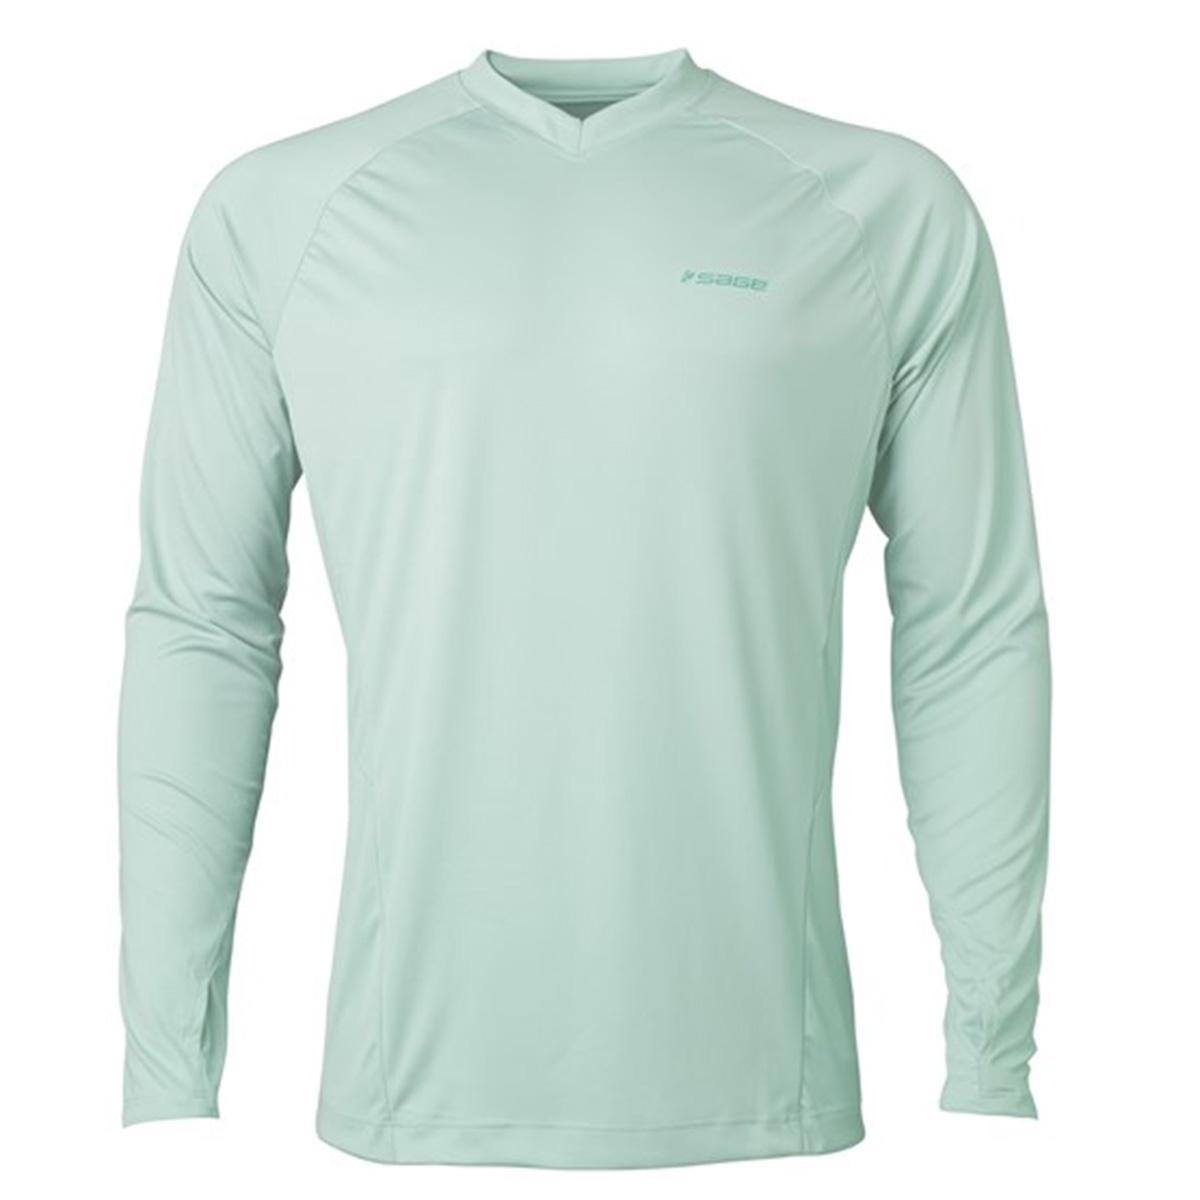 Sage sun shirt fishing shirts taimen for Fly fishing sun shirt